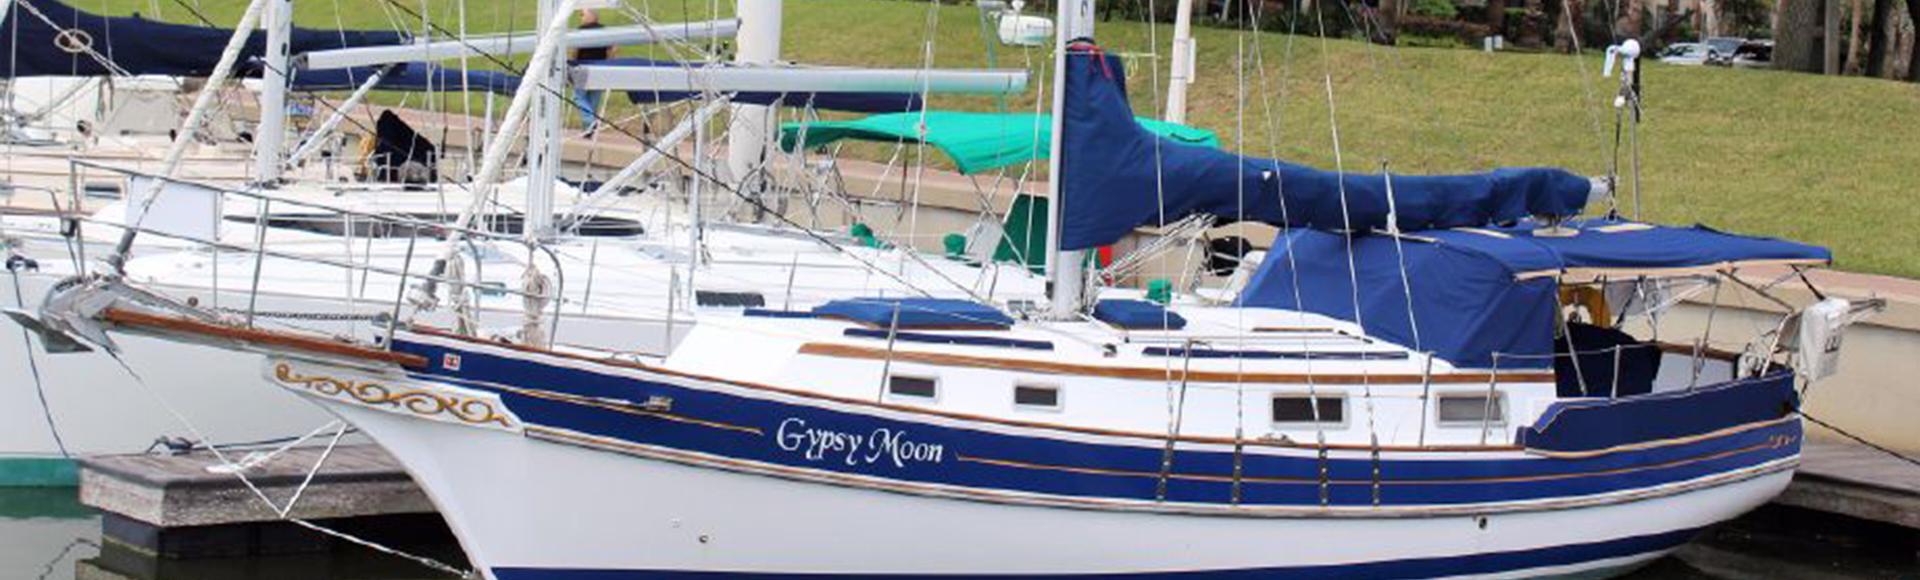 "SOLD FALL 2018 – 1988 Gozzard 36 Hull #38 ""Gypsy Moon"""